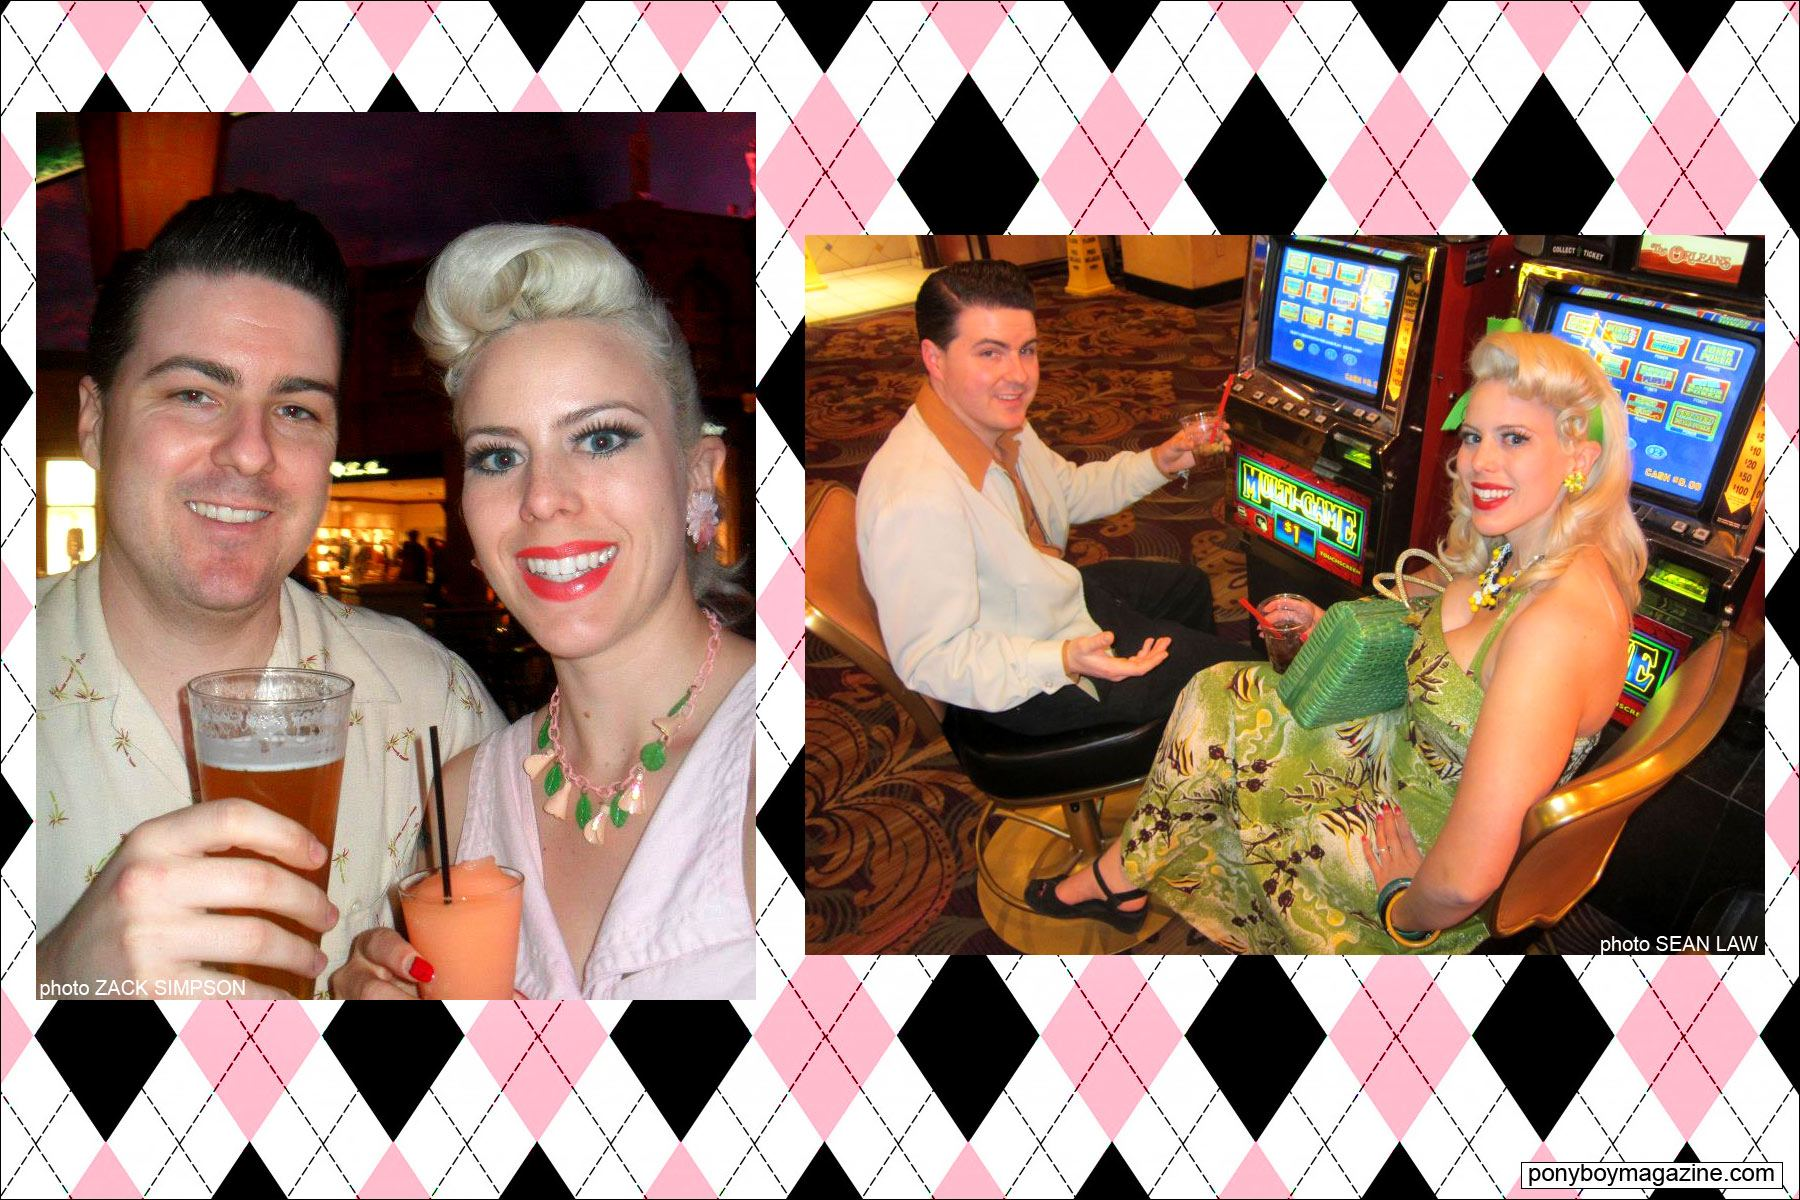 The Rockabilly Socialite, with her husband Zack Simpson. Ponyboy Magazine.